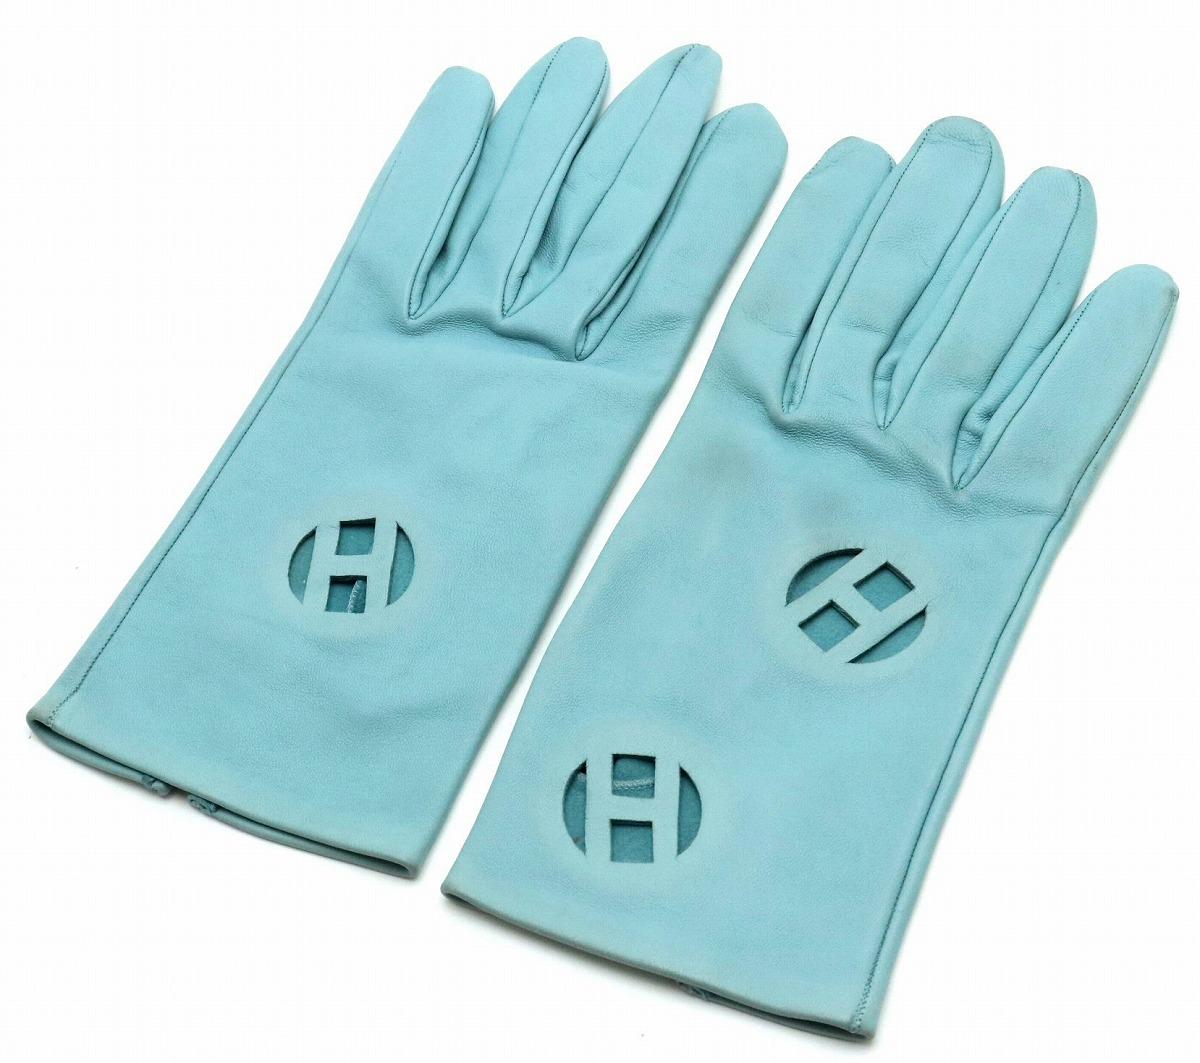 HERMES エルメス Hロゴ レザーグローブ 手袋 ライトブルー 水色 #L 【中古】